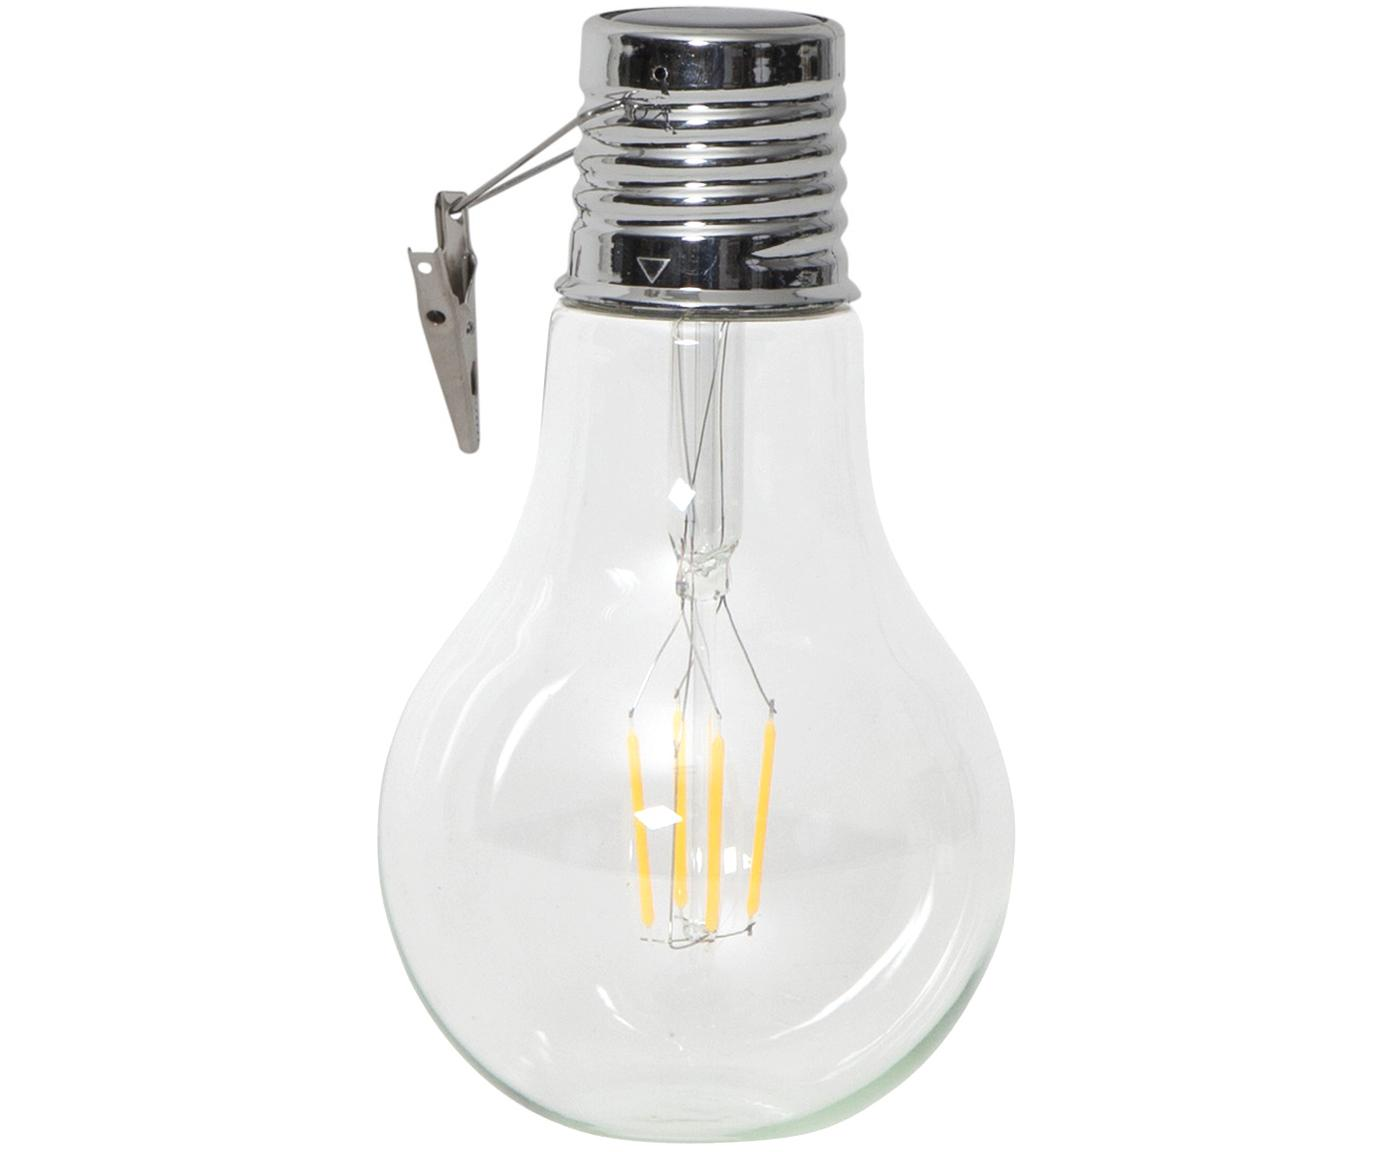 LED Solar-Leuchtobjekte Fille, 2 Stück, Transparent, Ø 10 x H 18 cm